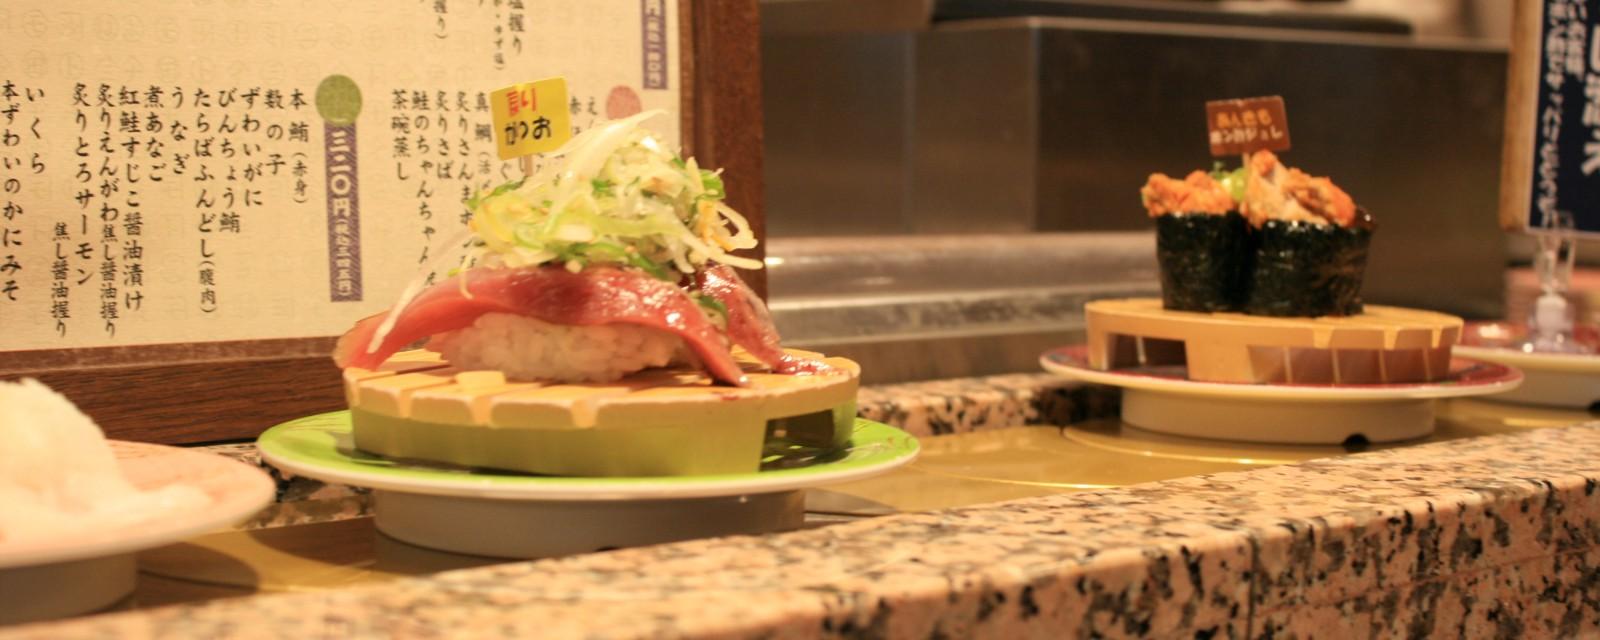 Nemuro Hanamaru: Conveyor Belt Sushi near Tokyo Station